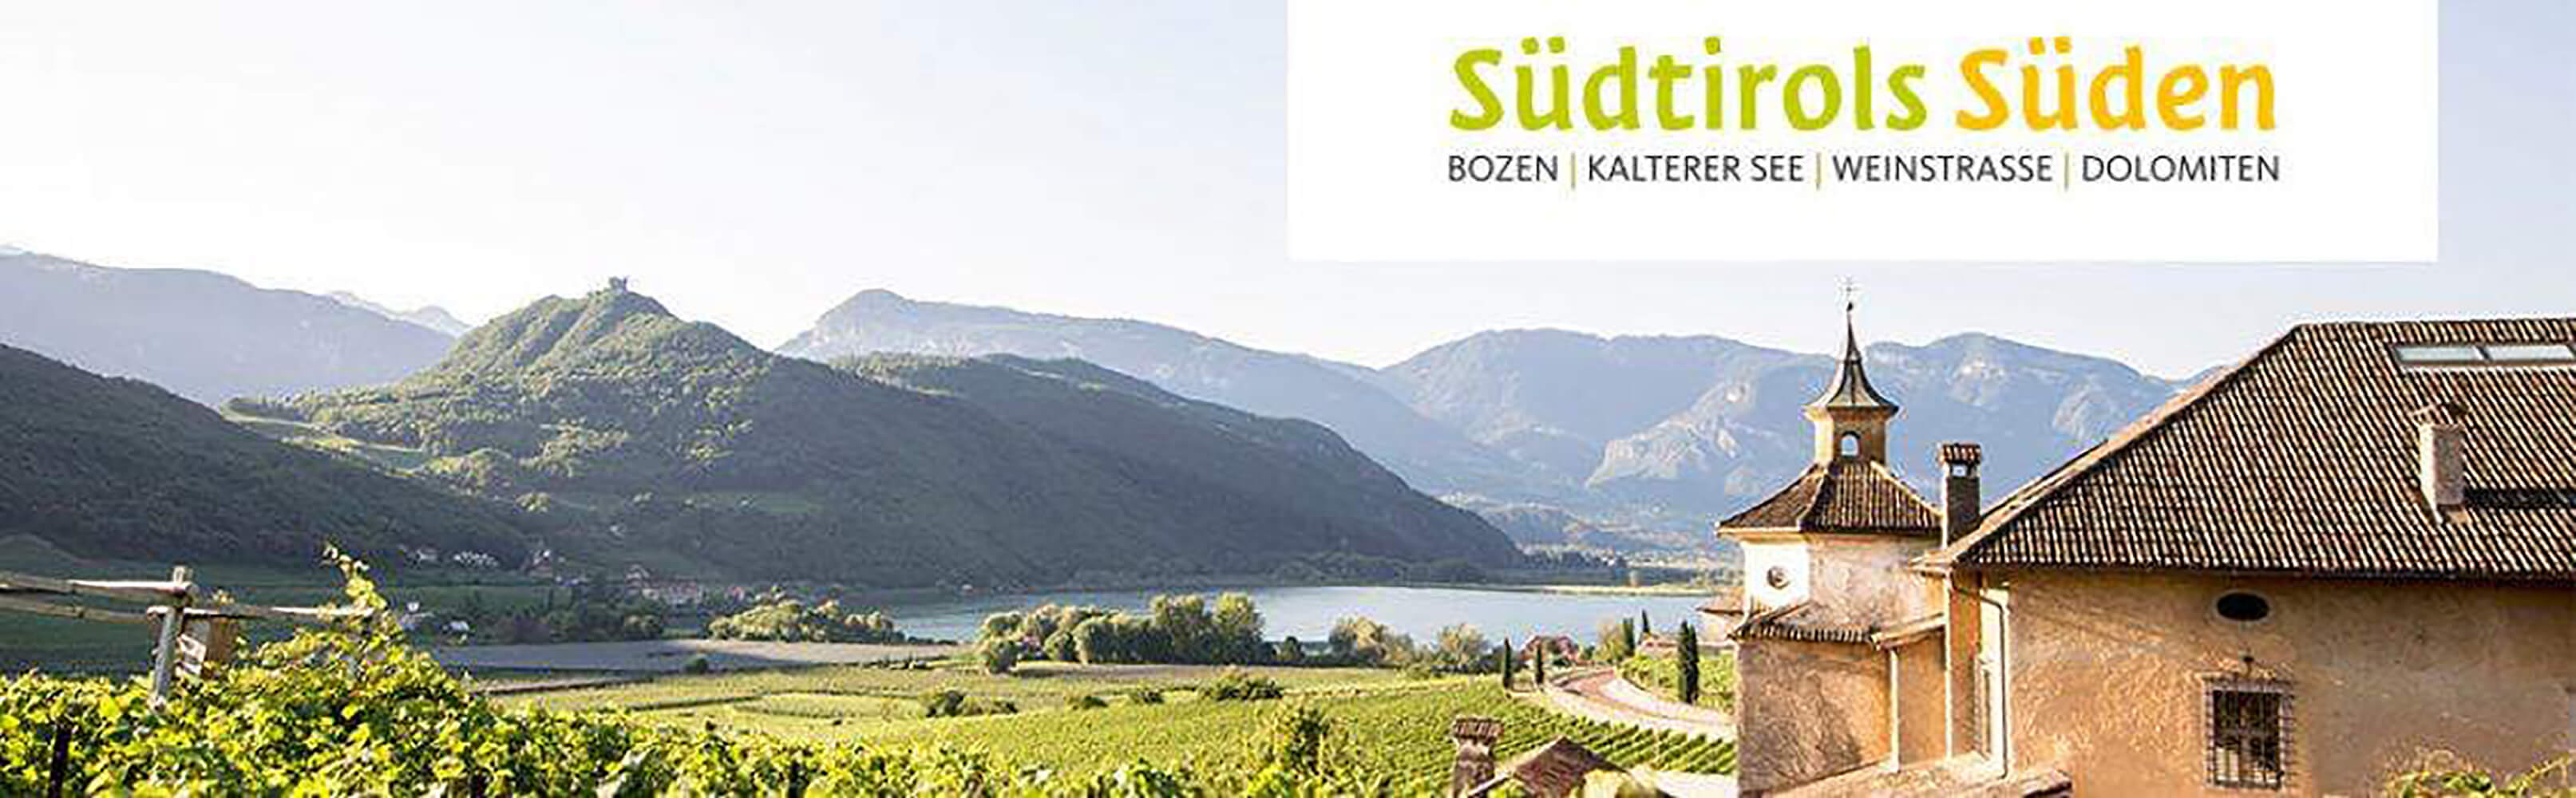 Kulturelle Vielfalt in Südtirols Süden  1